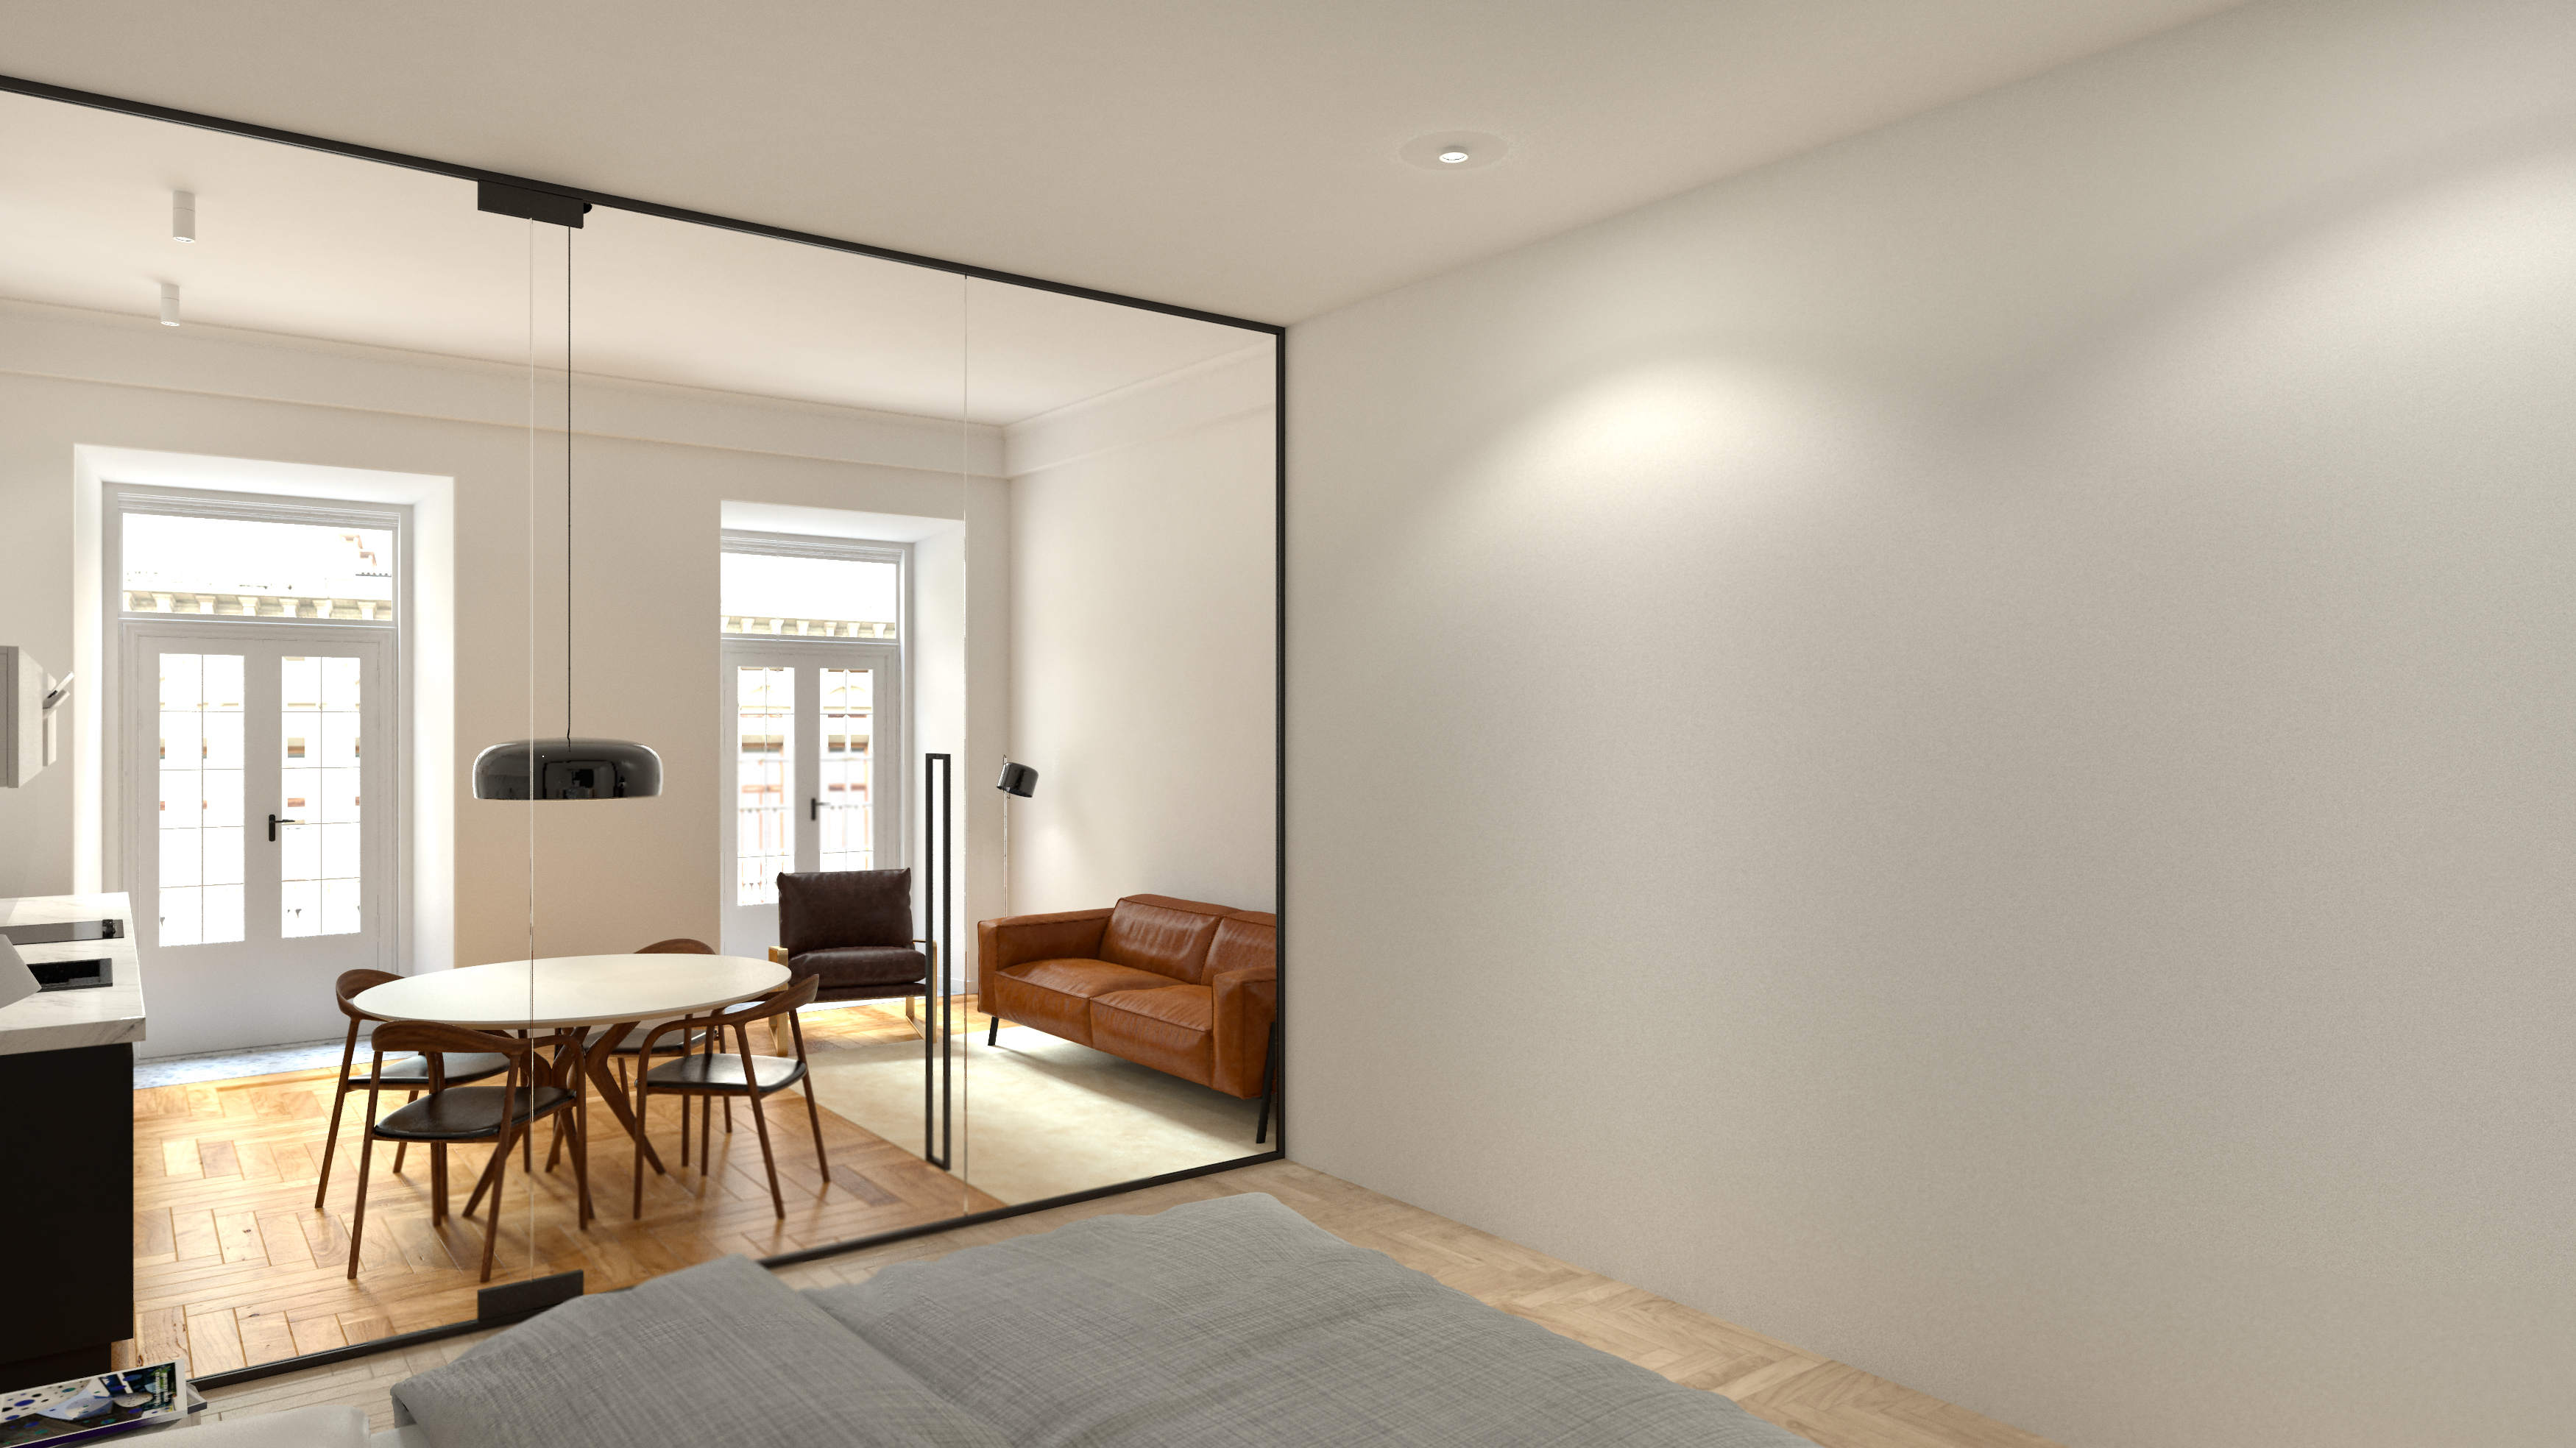 Interior de um projeto de Virtual Staging / Staging Factory